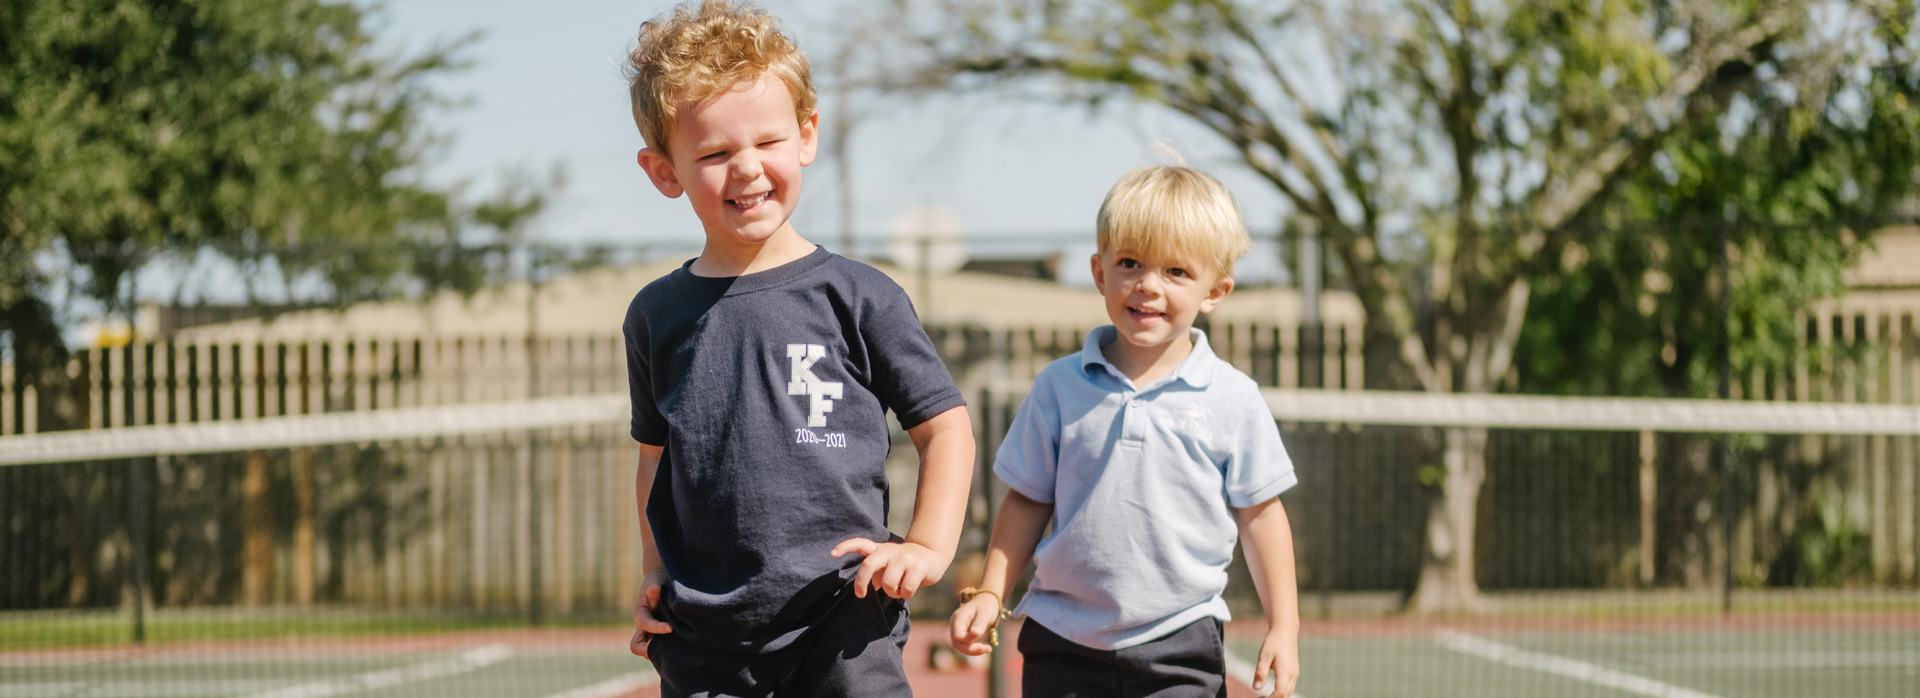 Kehoe-France Southshore | Private Preschool & Kindergarten Programs